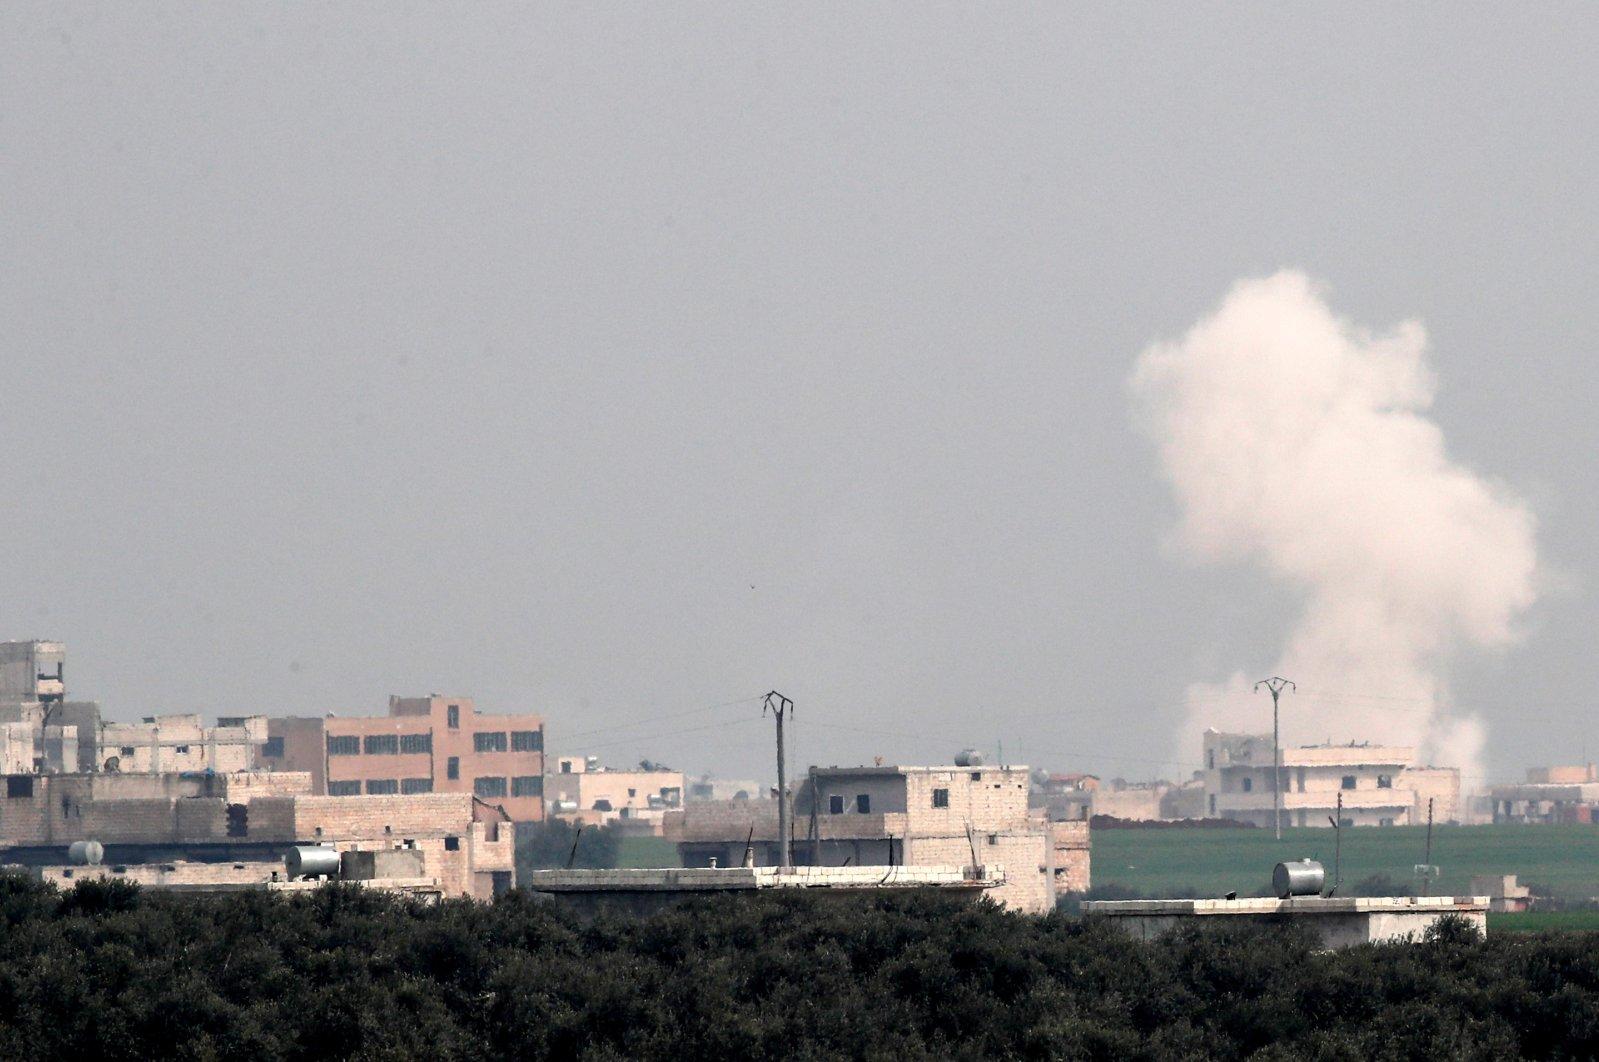 Smoke rises after an air strike in Saraqib in Idlib province, Syria, Feb. 28, 2020. (Reuters Photo)